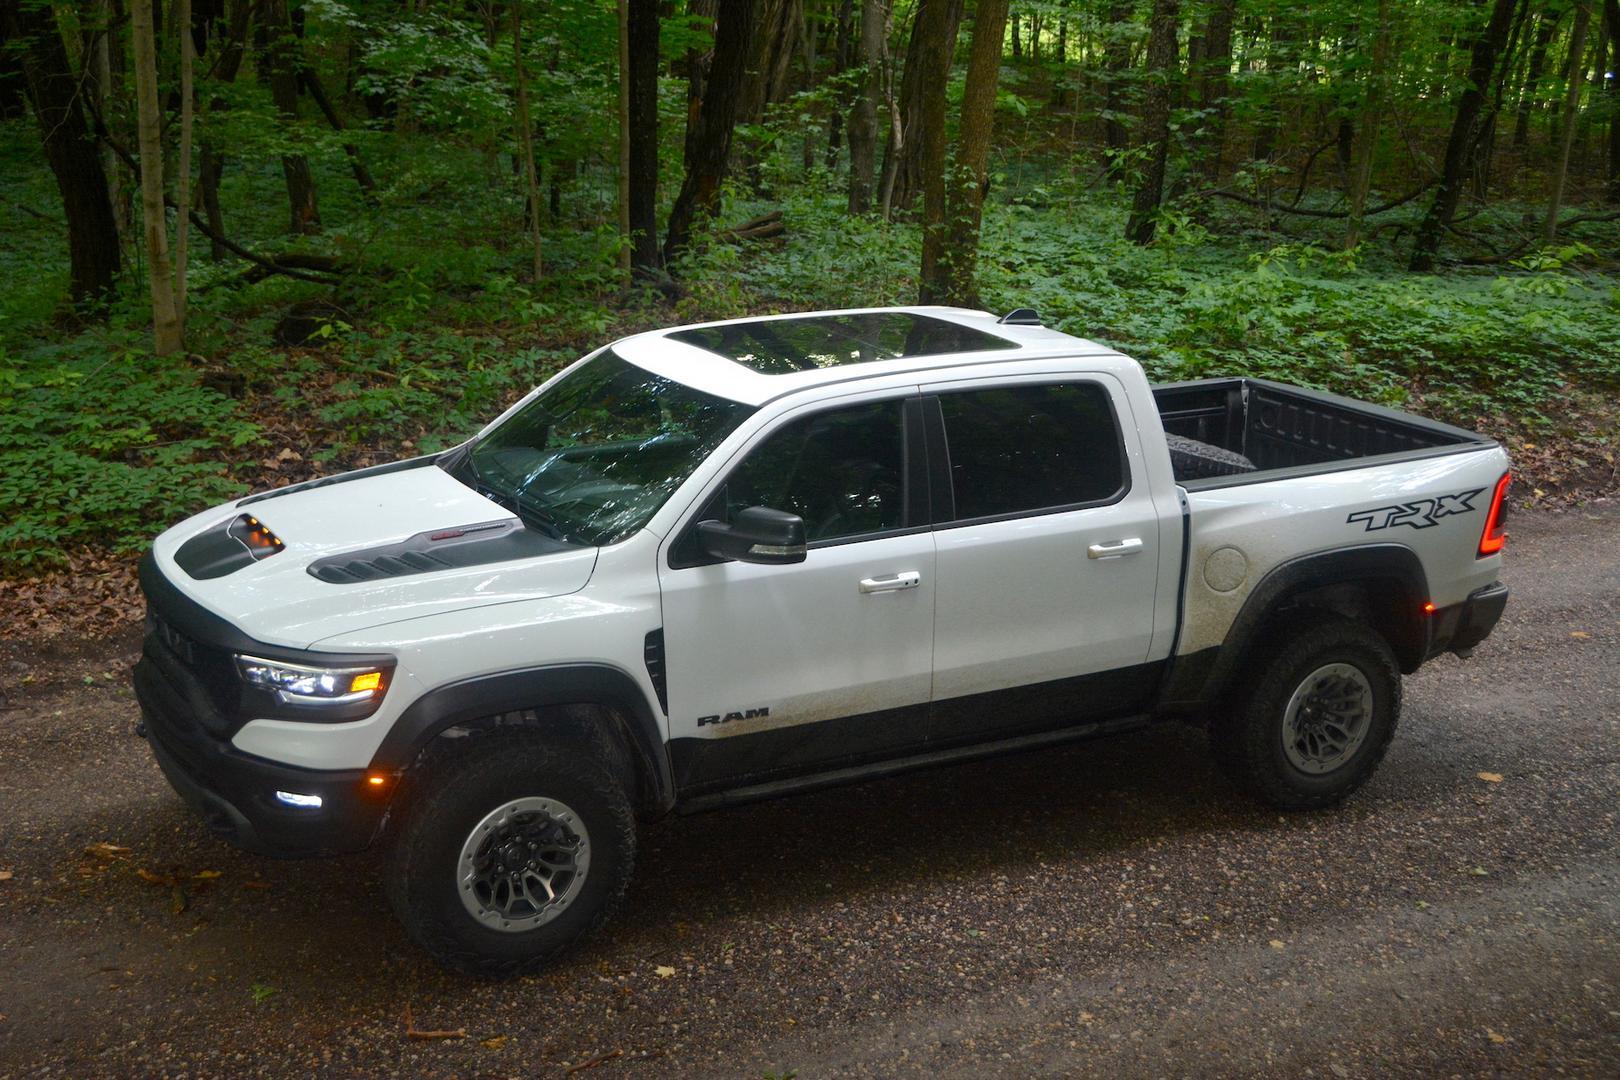 2021 Ram 1500 TRX review